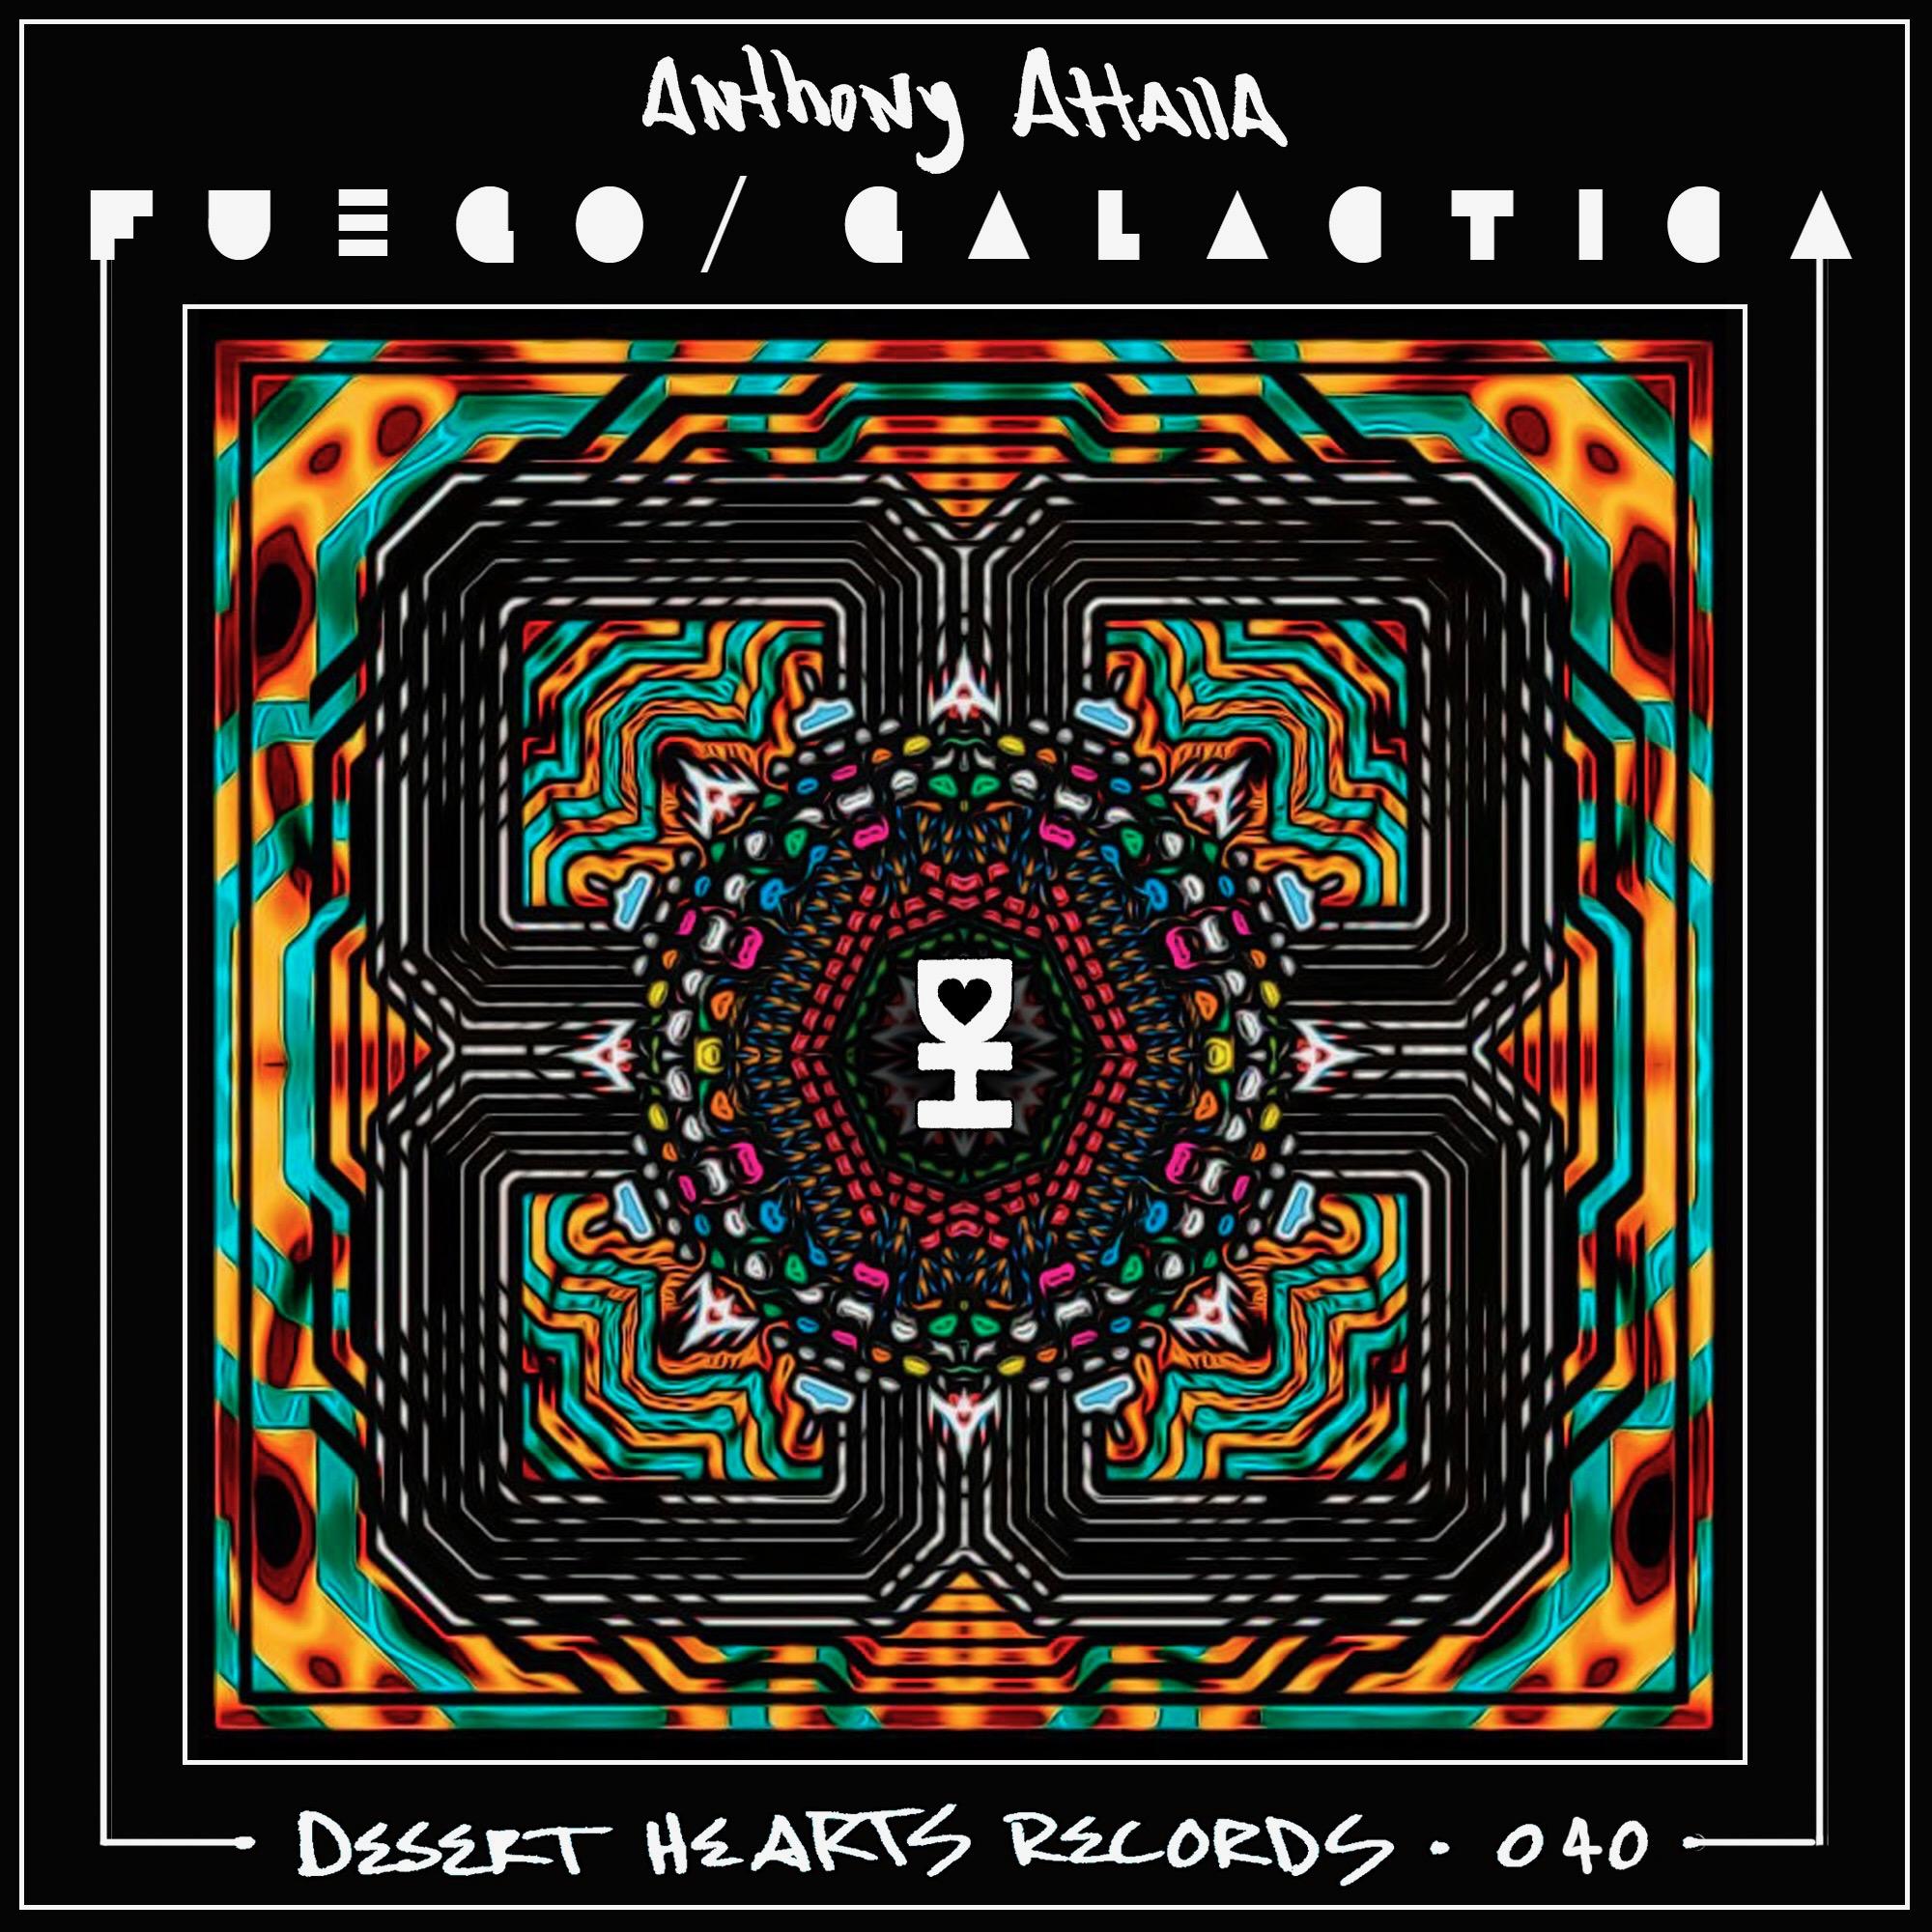 [DH040] Anthony Attalla - Fuego : Galactica EP.jpeg